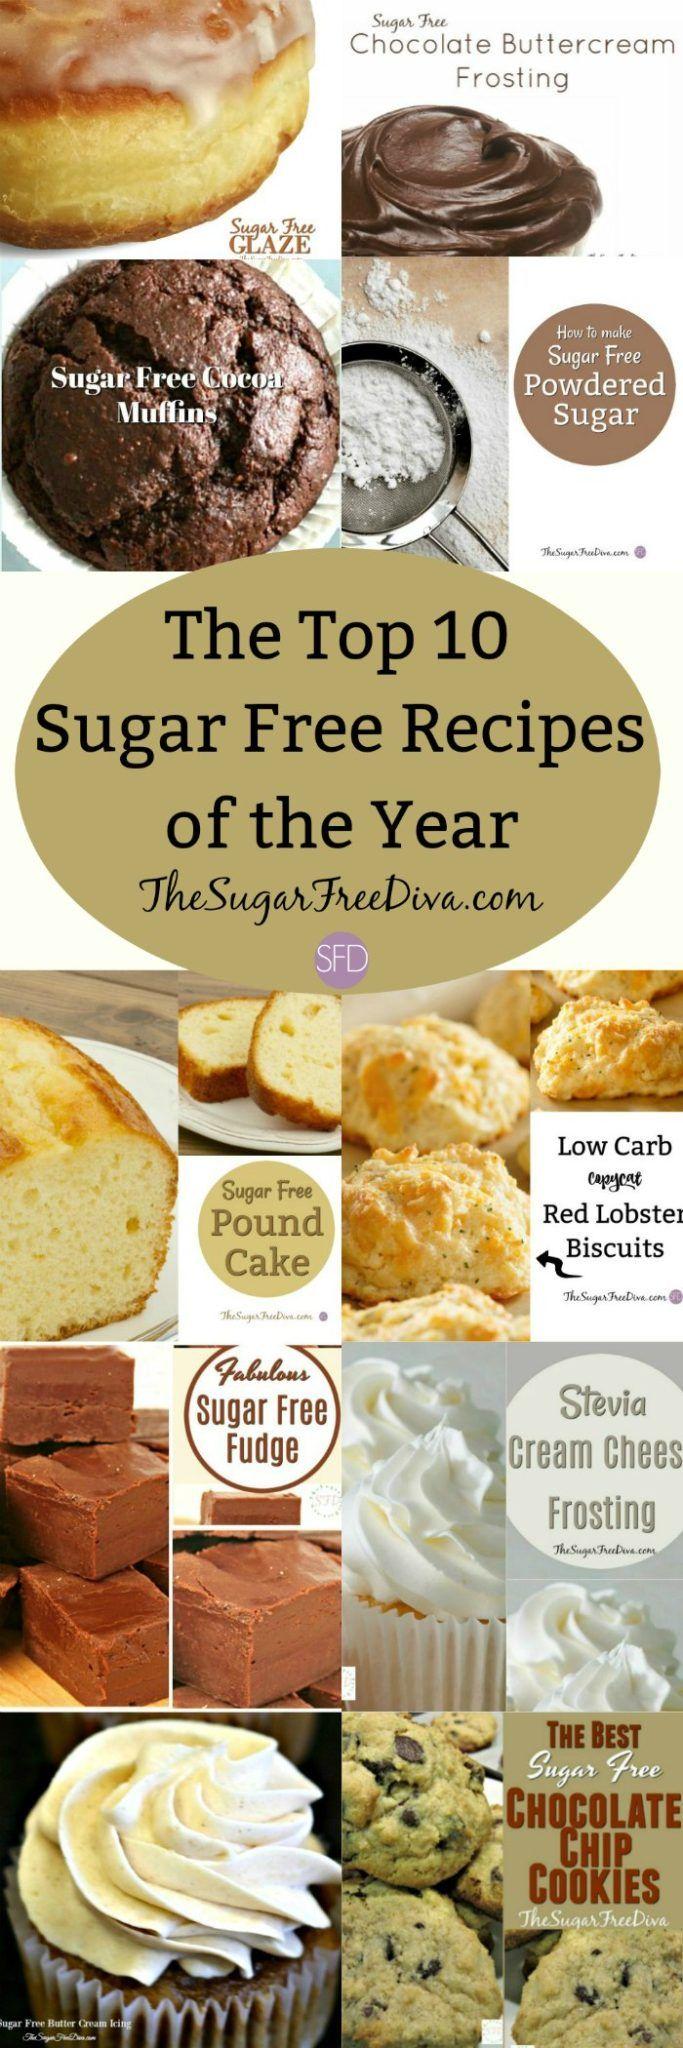 The Top 10 Sugar Free Recipes of the Year #sugarfree #recipes #sugarfreerecipe #dessert #popular #yummy